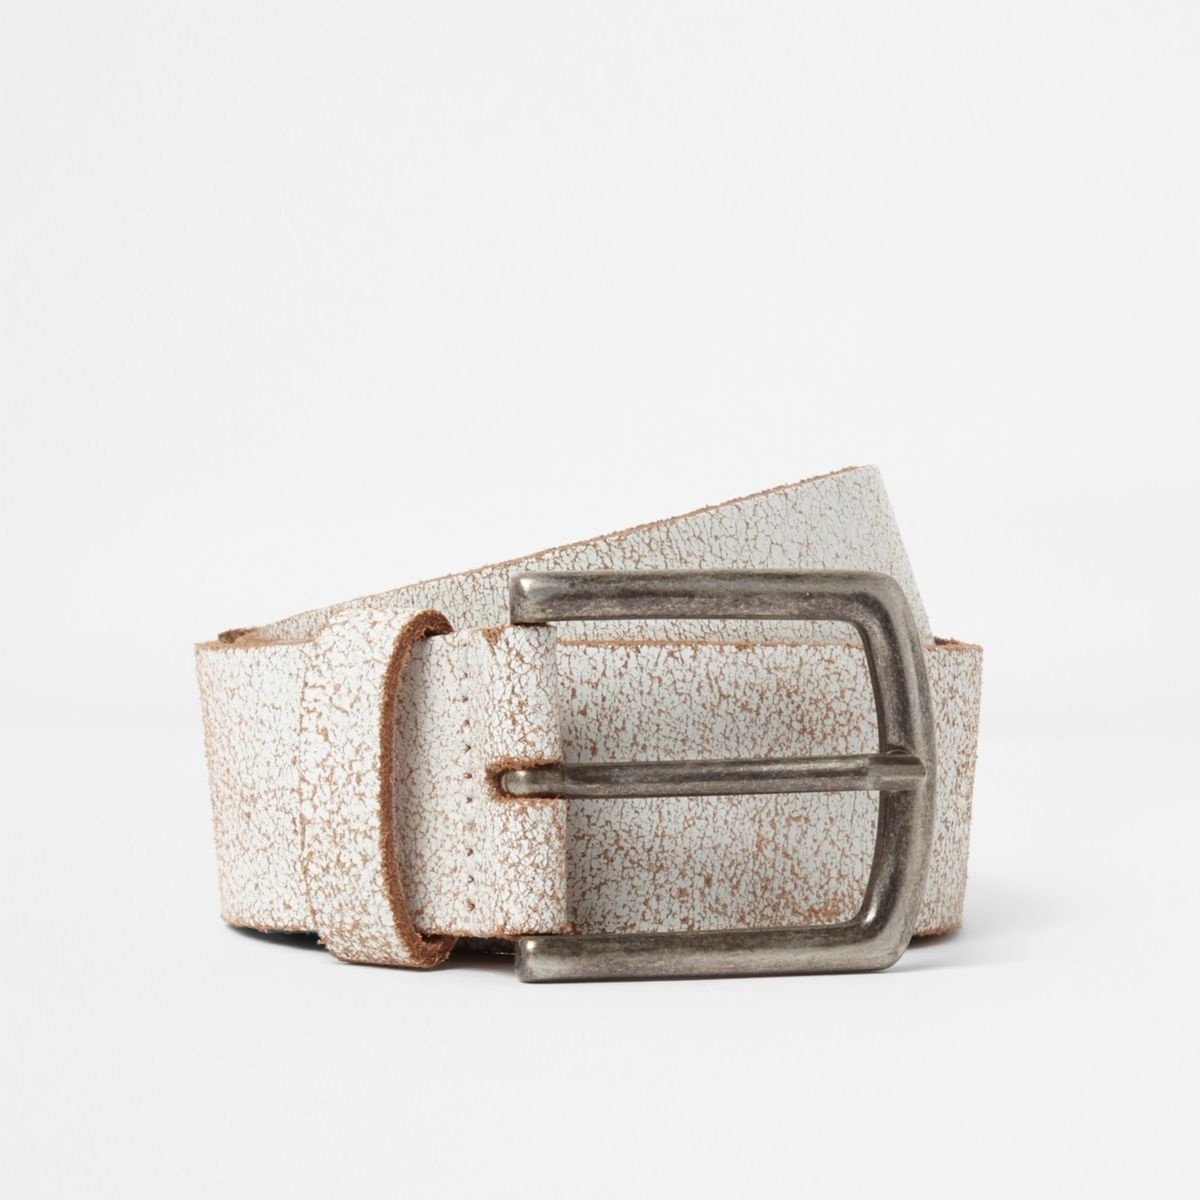 White cracked stud belt